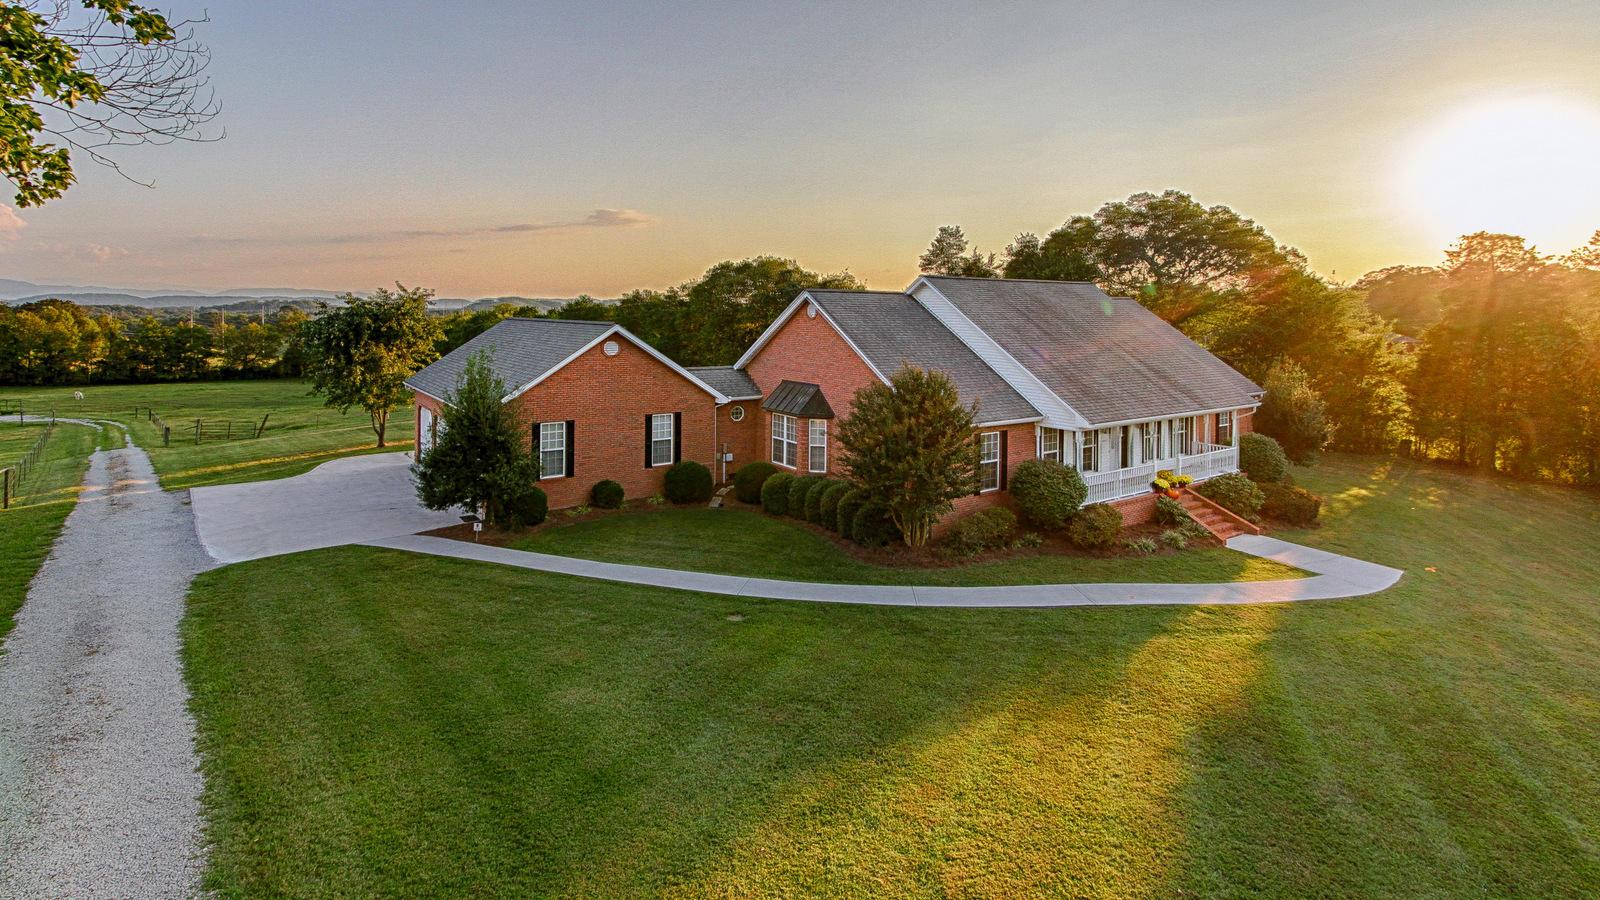 605 S Carter School Rd, Strawberry Plains, TN 37871